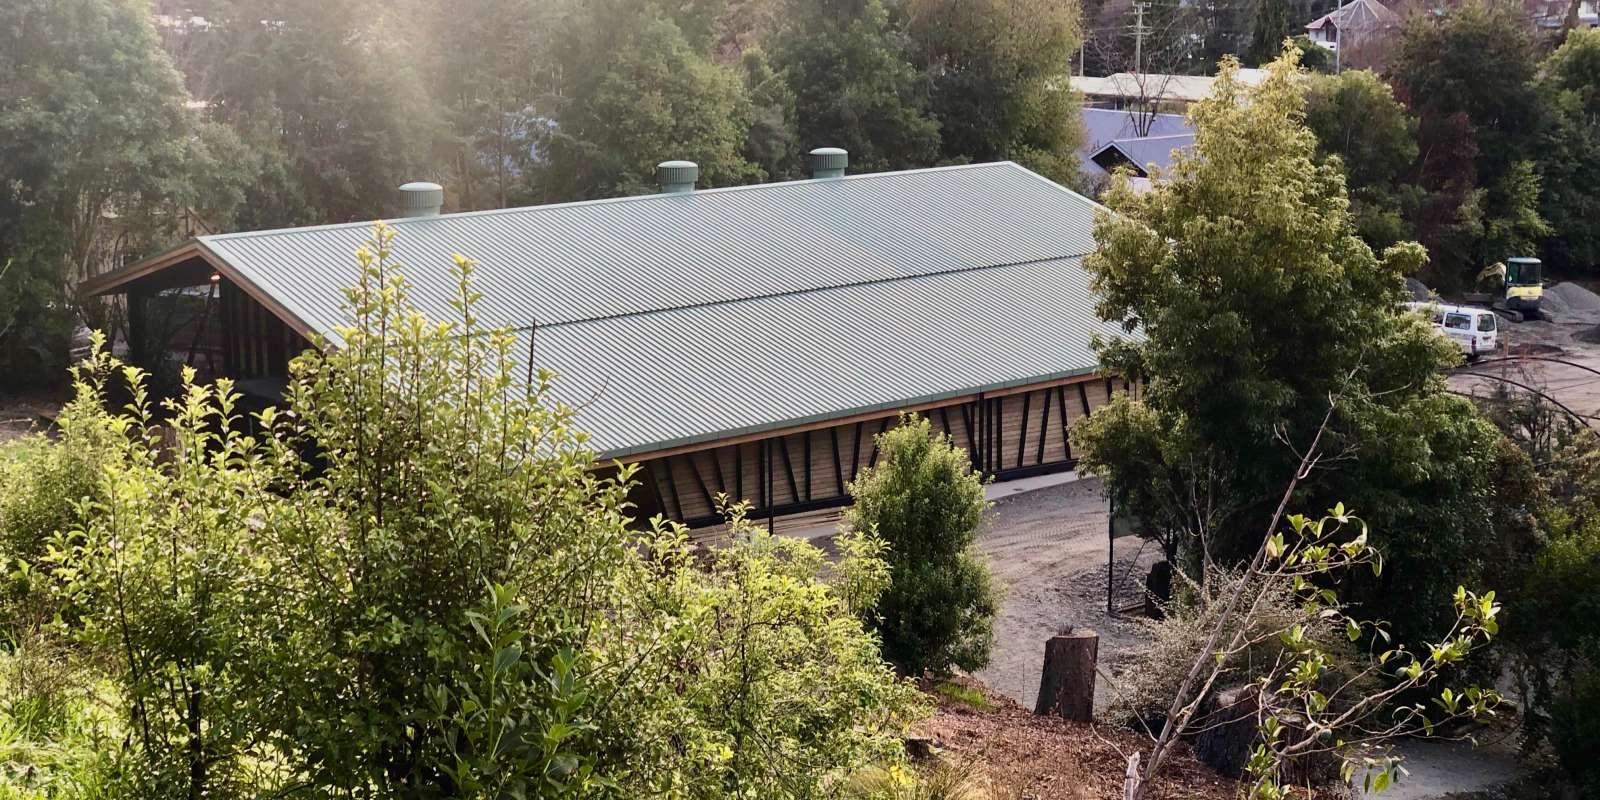 The new Kiwi house at Kiwi Birdlife Park